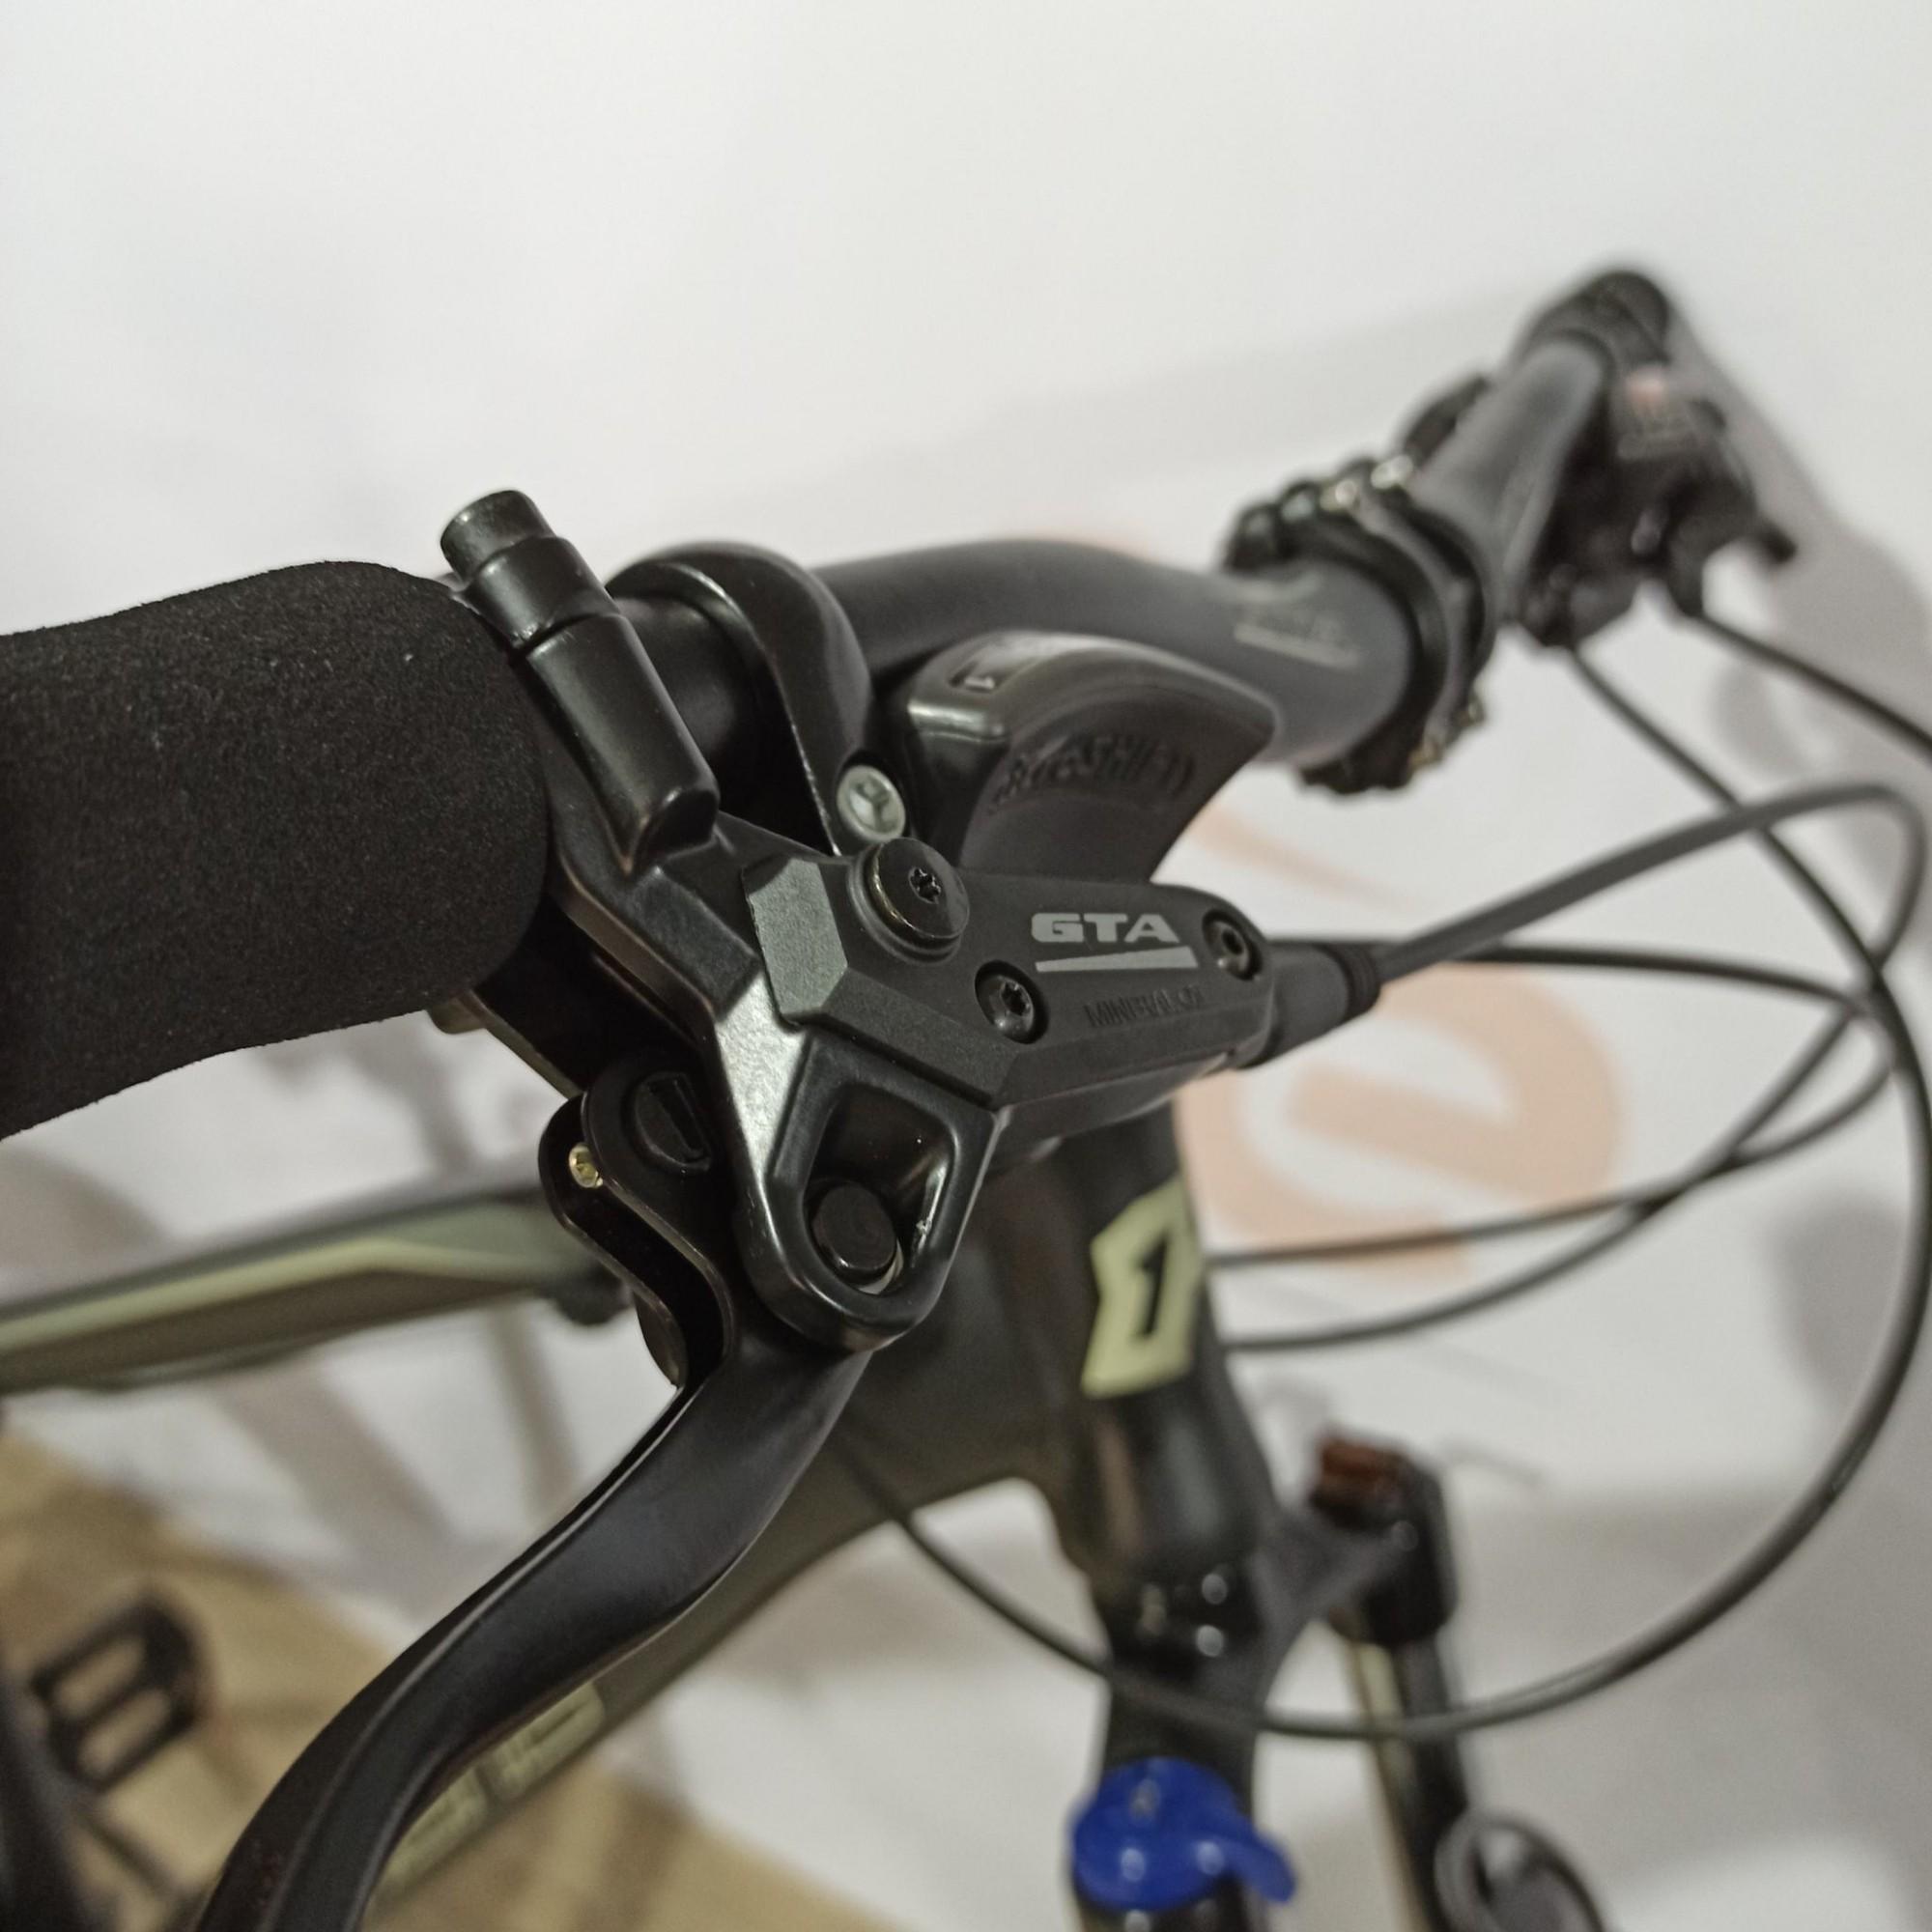 Bicicleta HIGH ONE Neo aro 29 - 24v MicroShift - Freio GTA Hidráulico - Suspensão BikeMax c/ trava no ombro